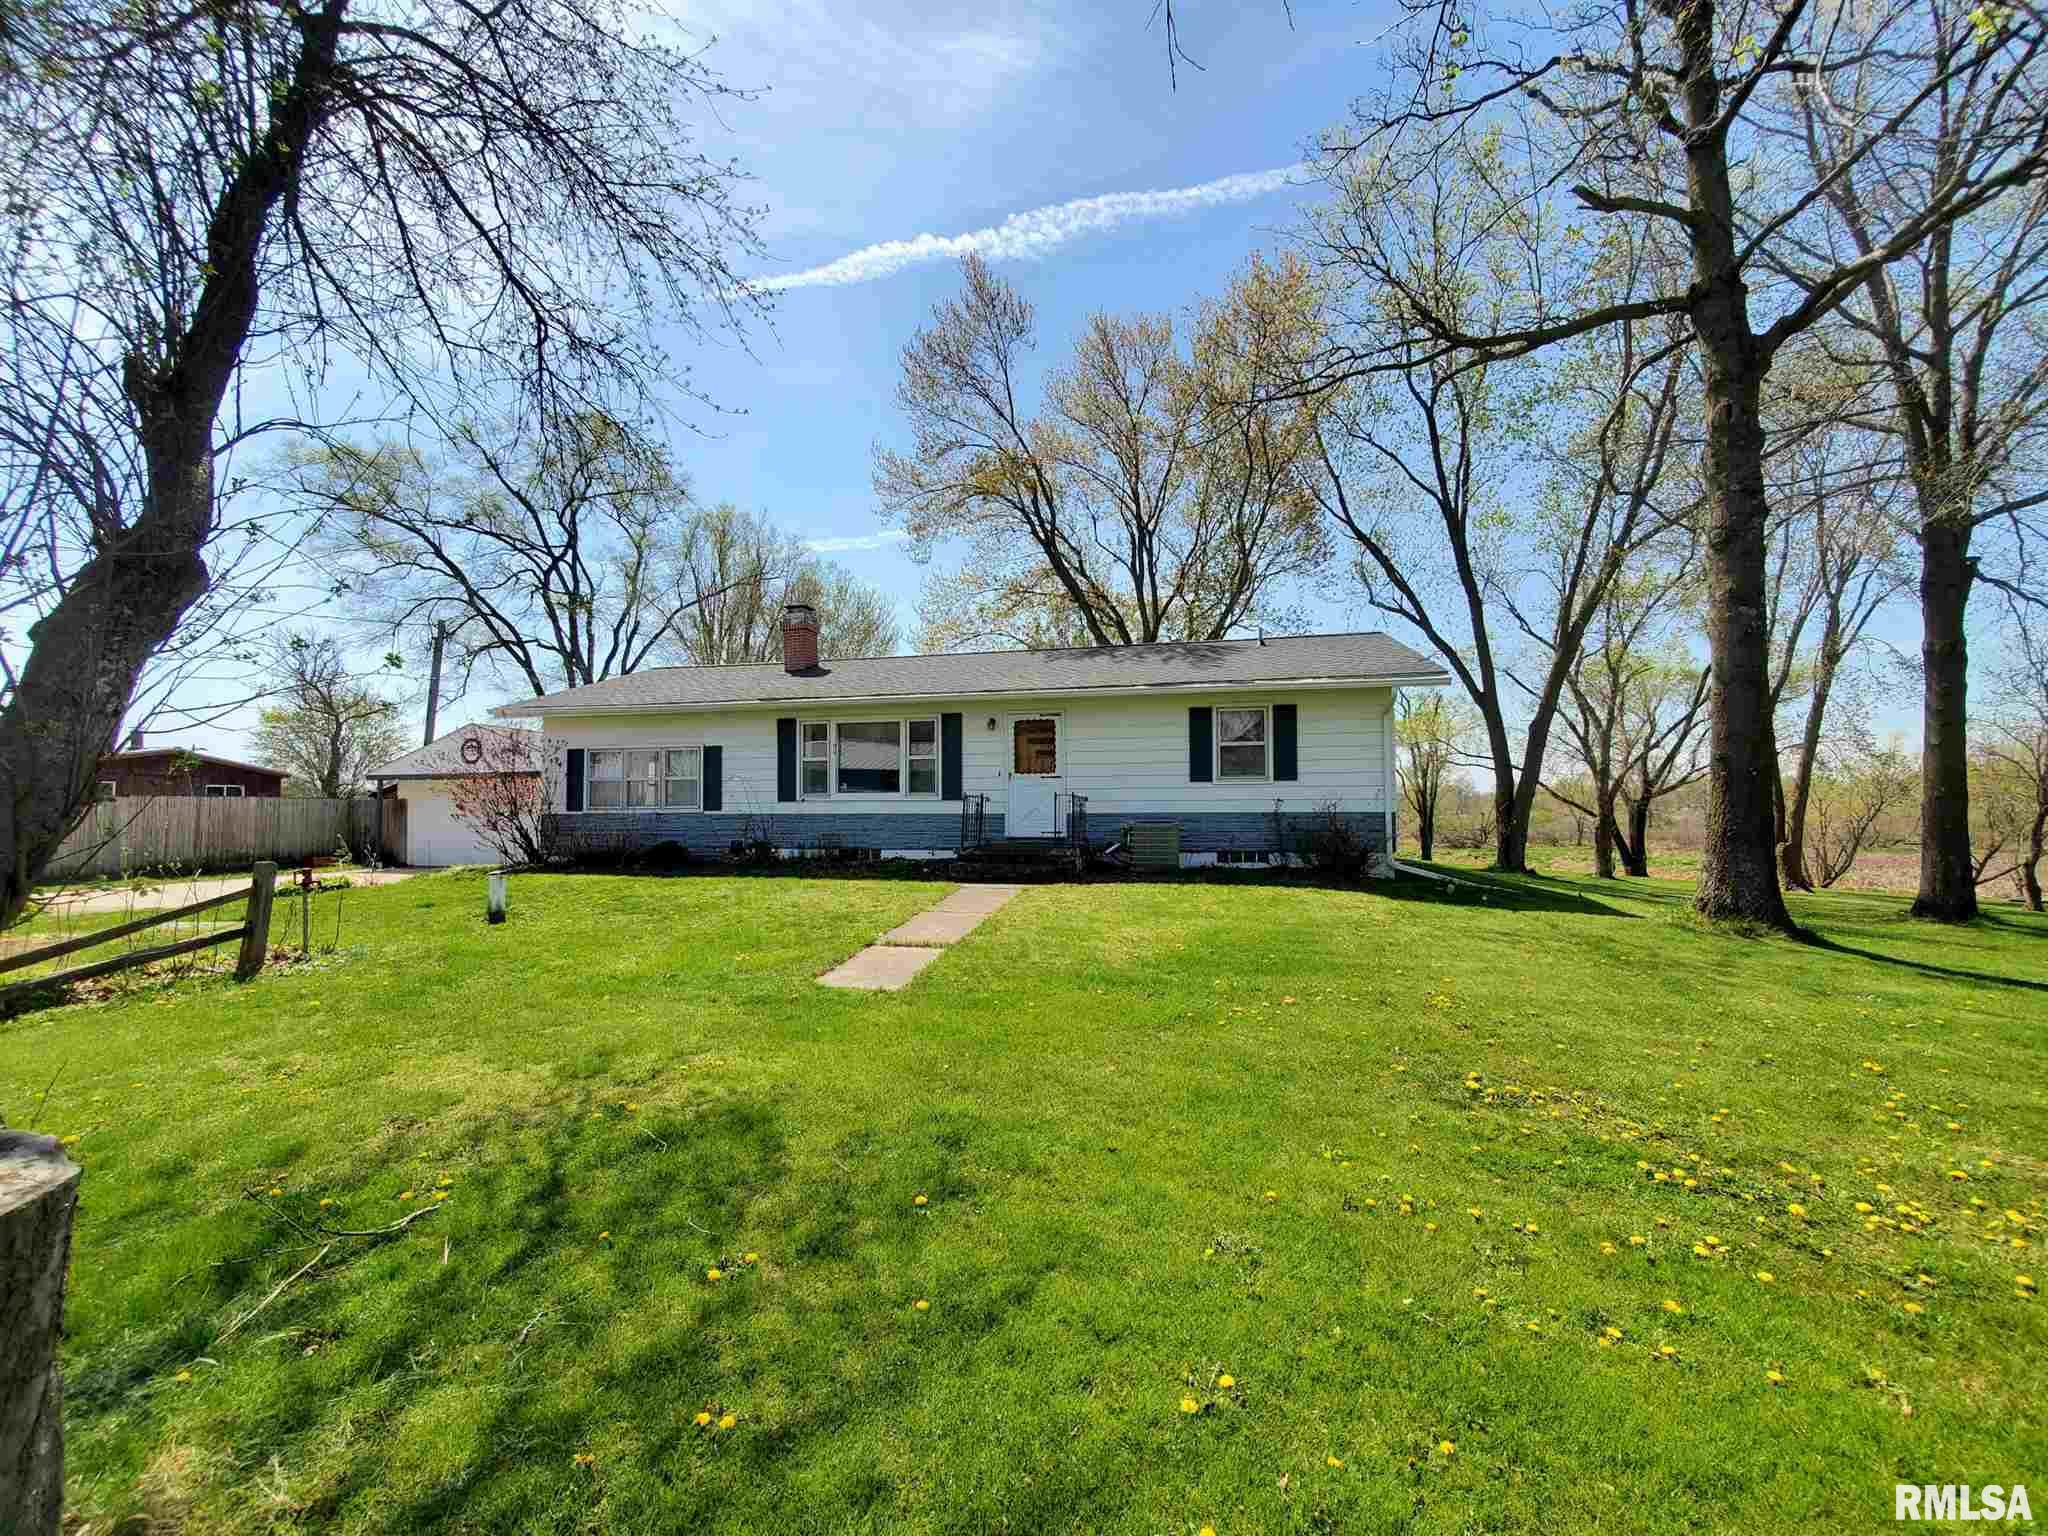 2869 270TH Property Photo - De Witt, IA real estate listing